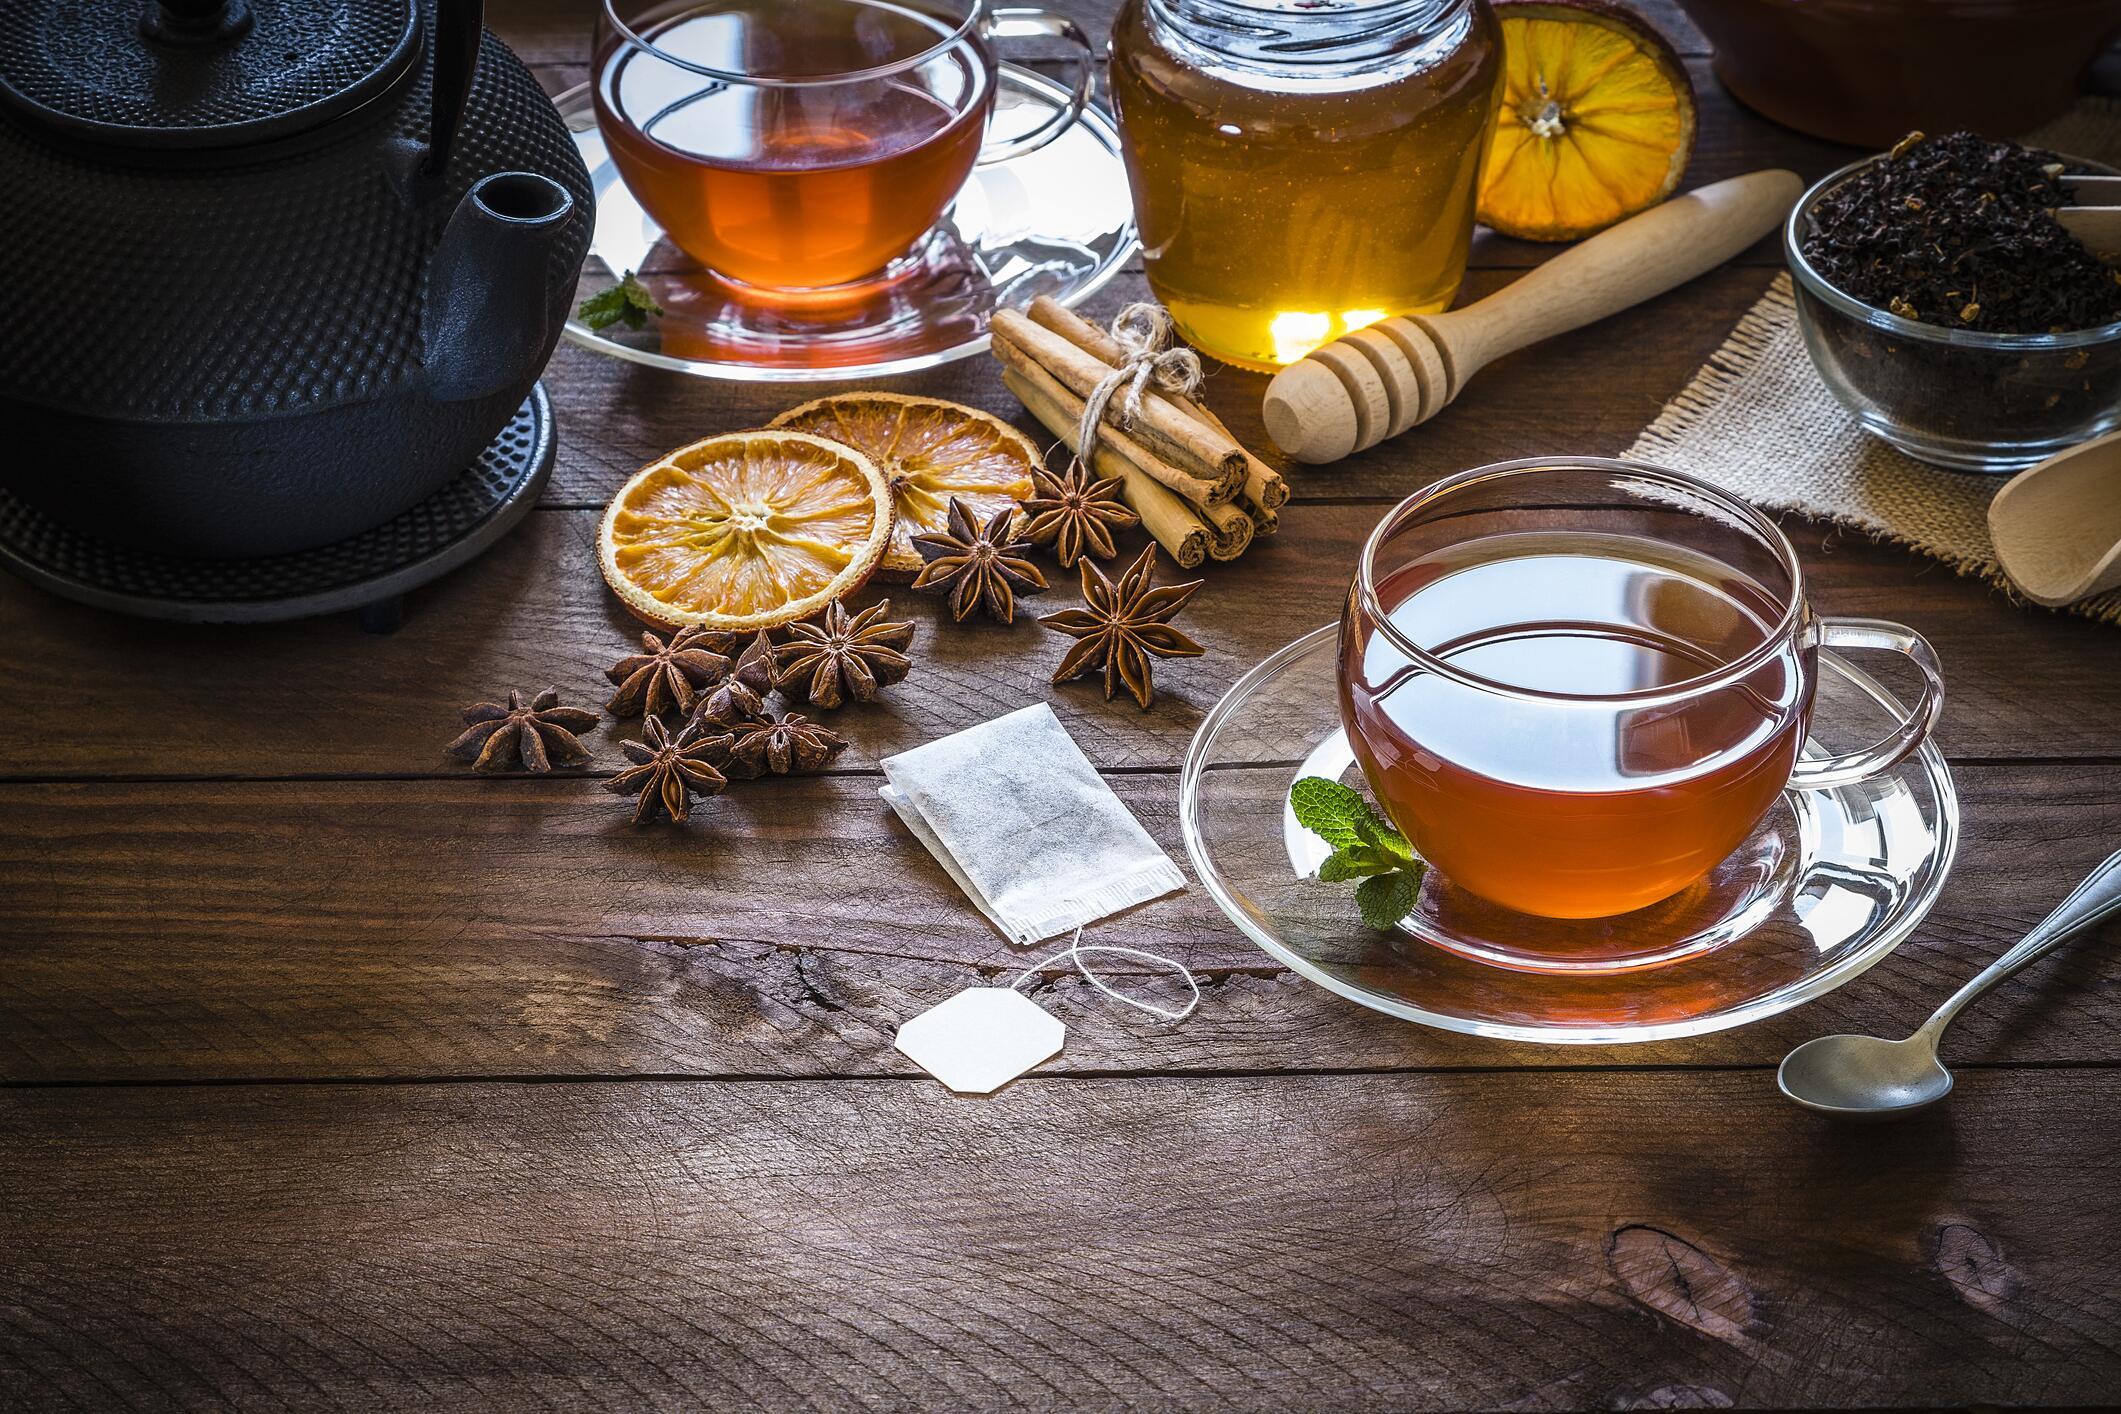 Bild zu Tee, Teeliebhaber, Teesorten, Teezubehör, Teeservice, Teekanne, Teetasse, Teebeutel